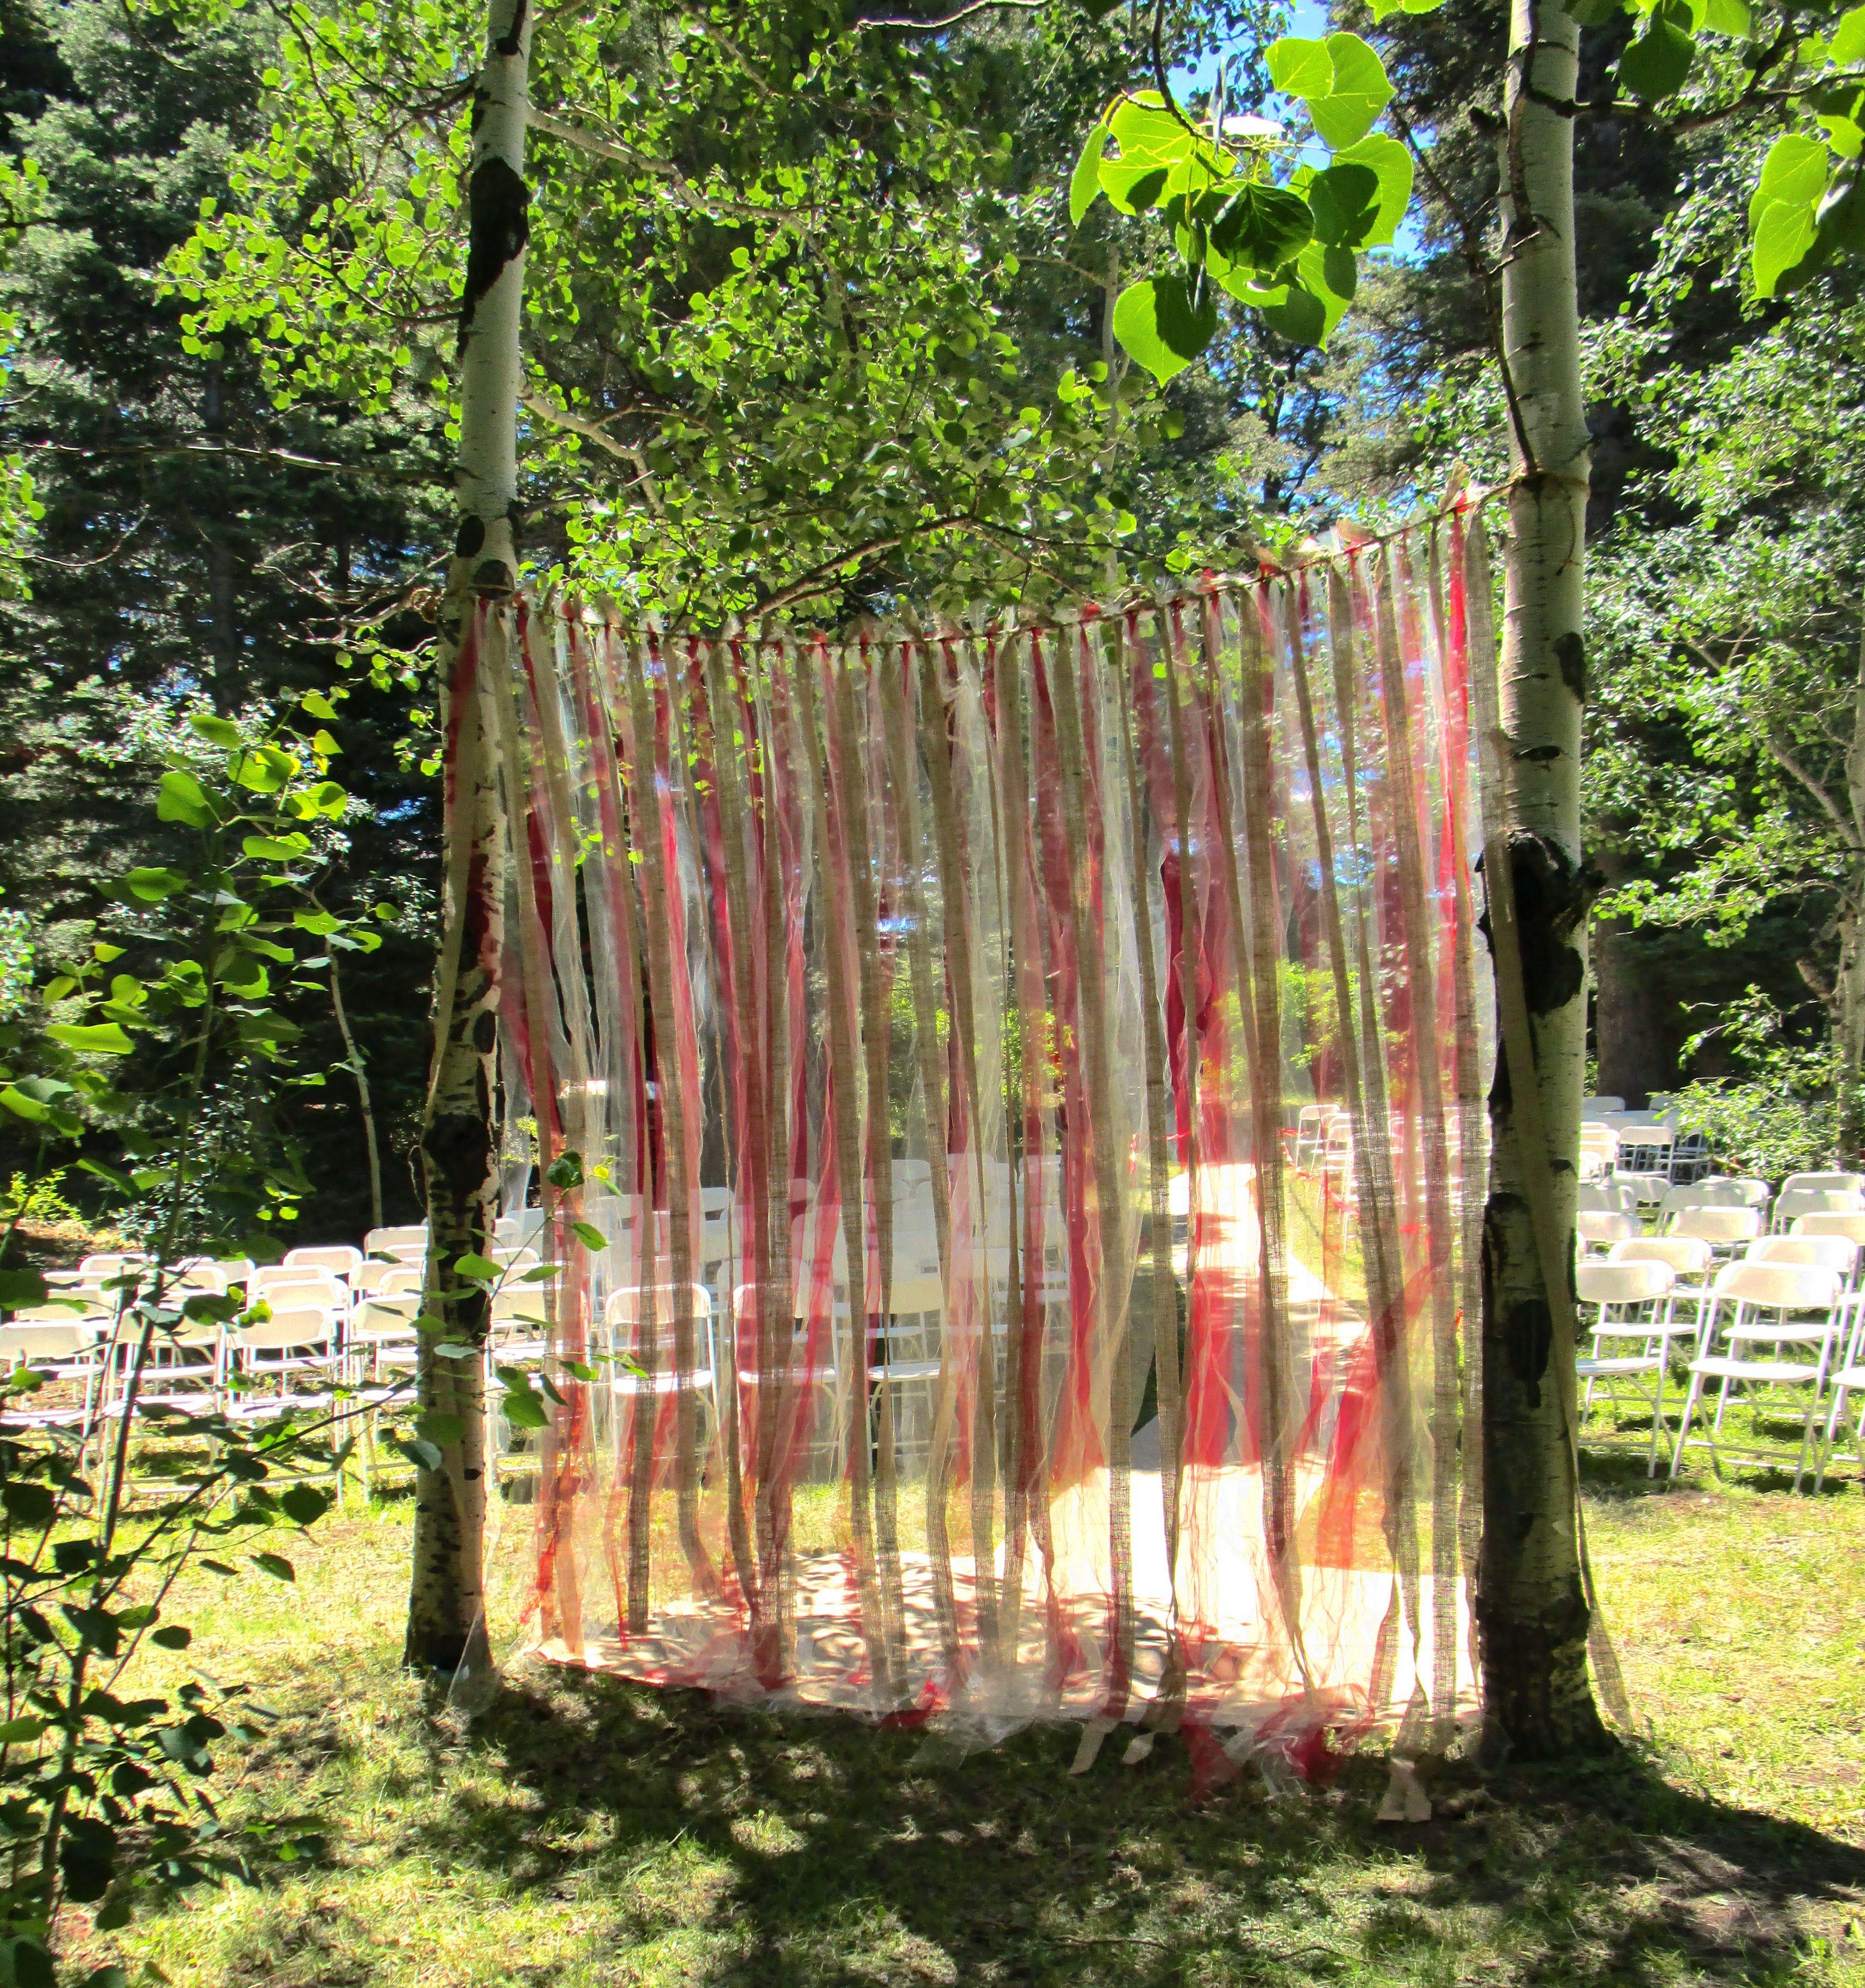 Rustic Wedding Arbors: Colorful Rustic Wedding Arbor